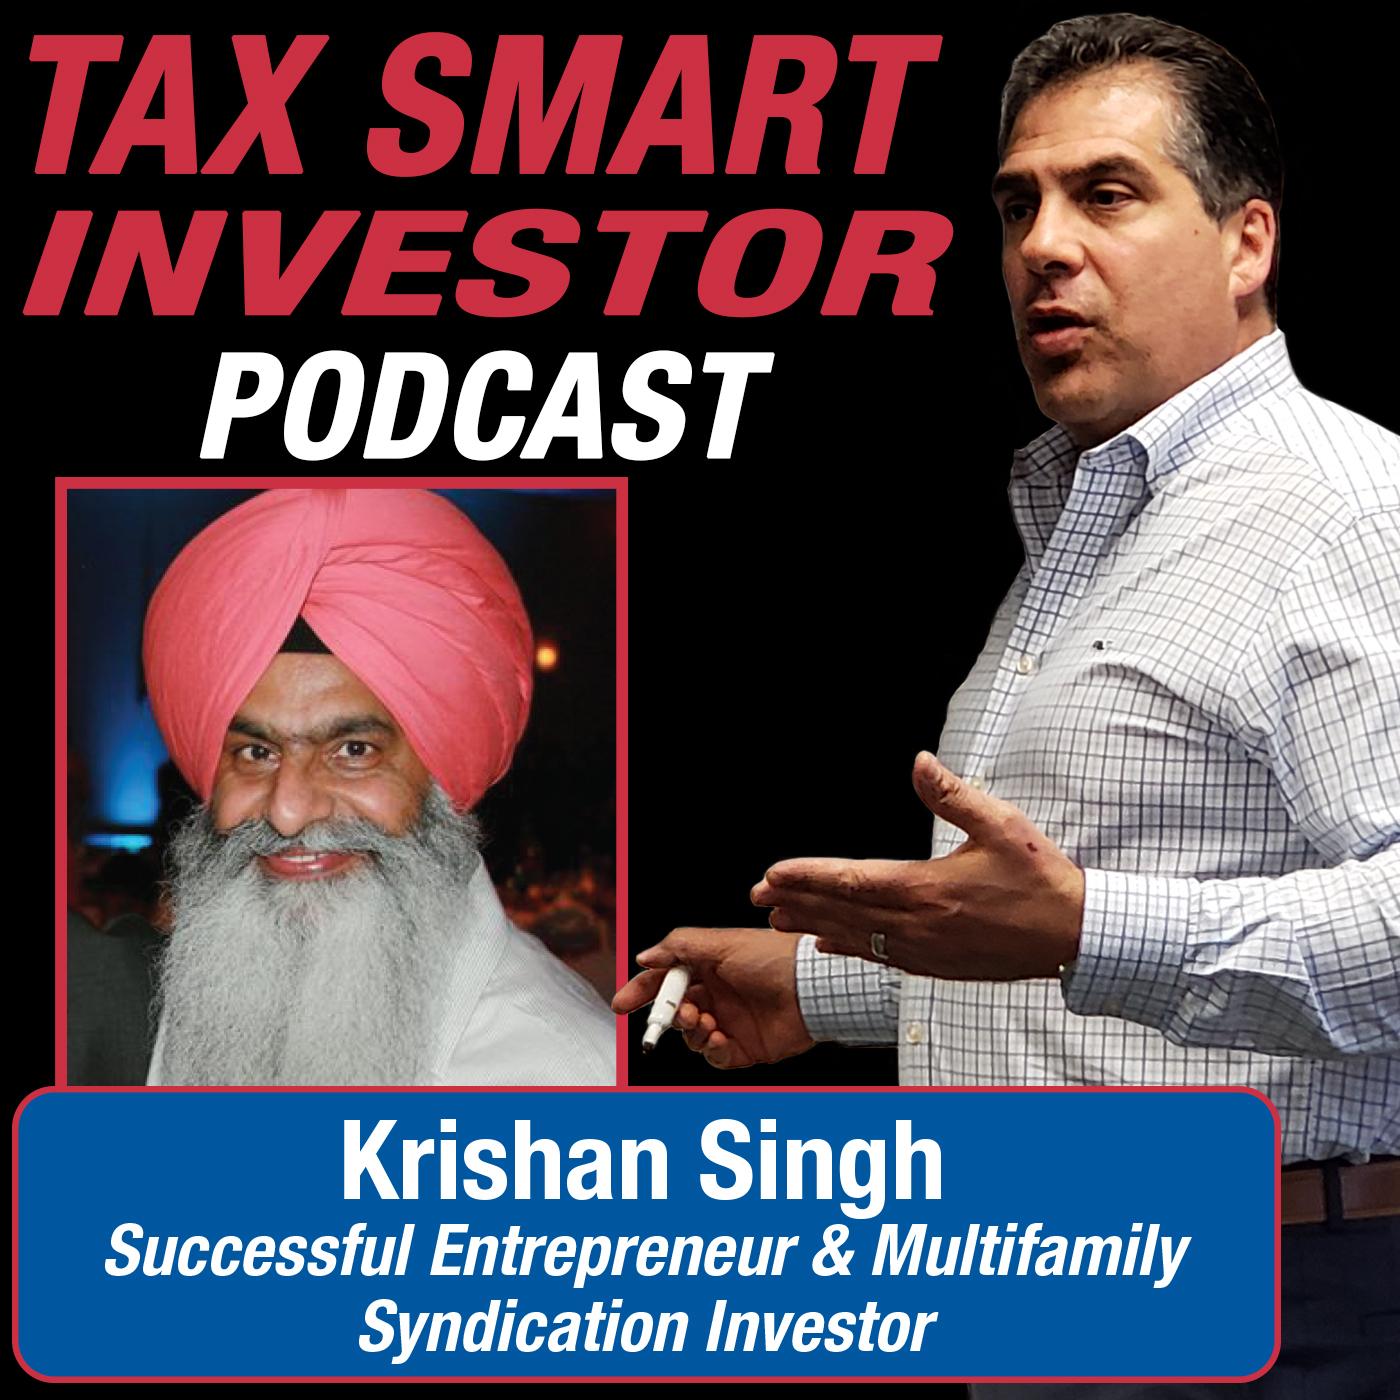 Tax Smart Investor featuring Krishan Singh